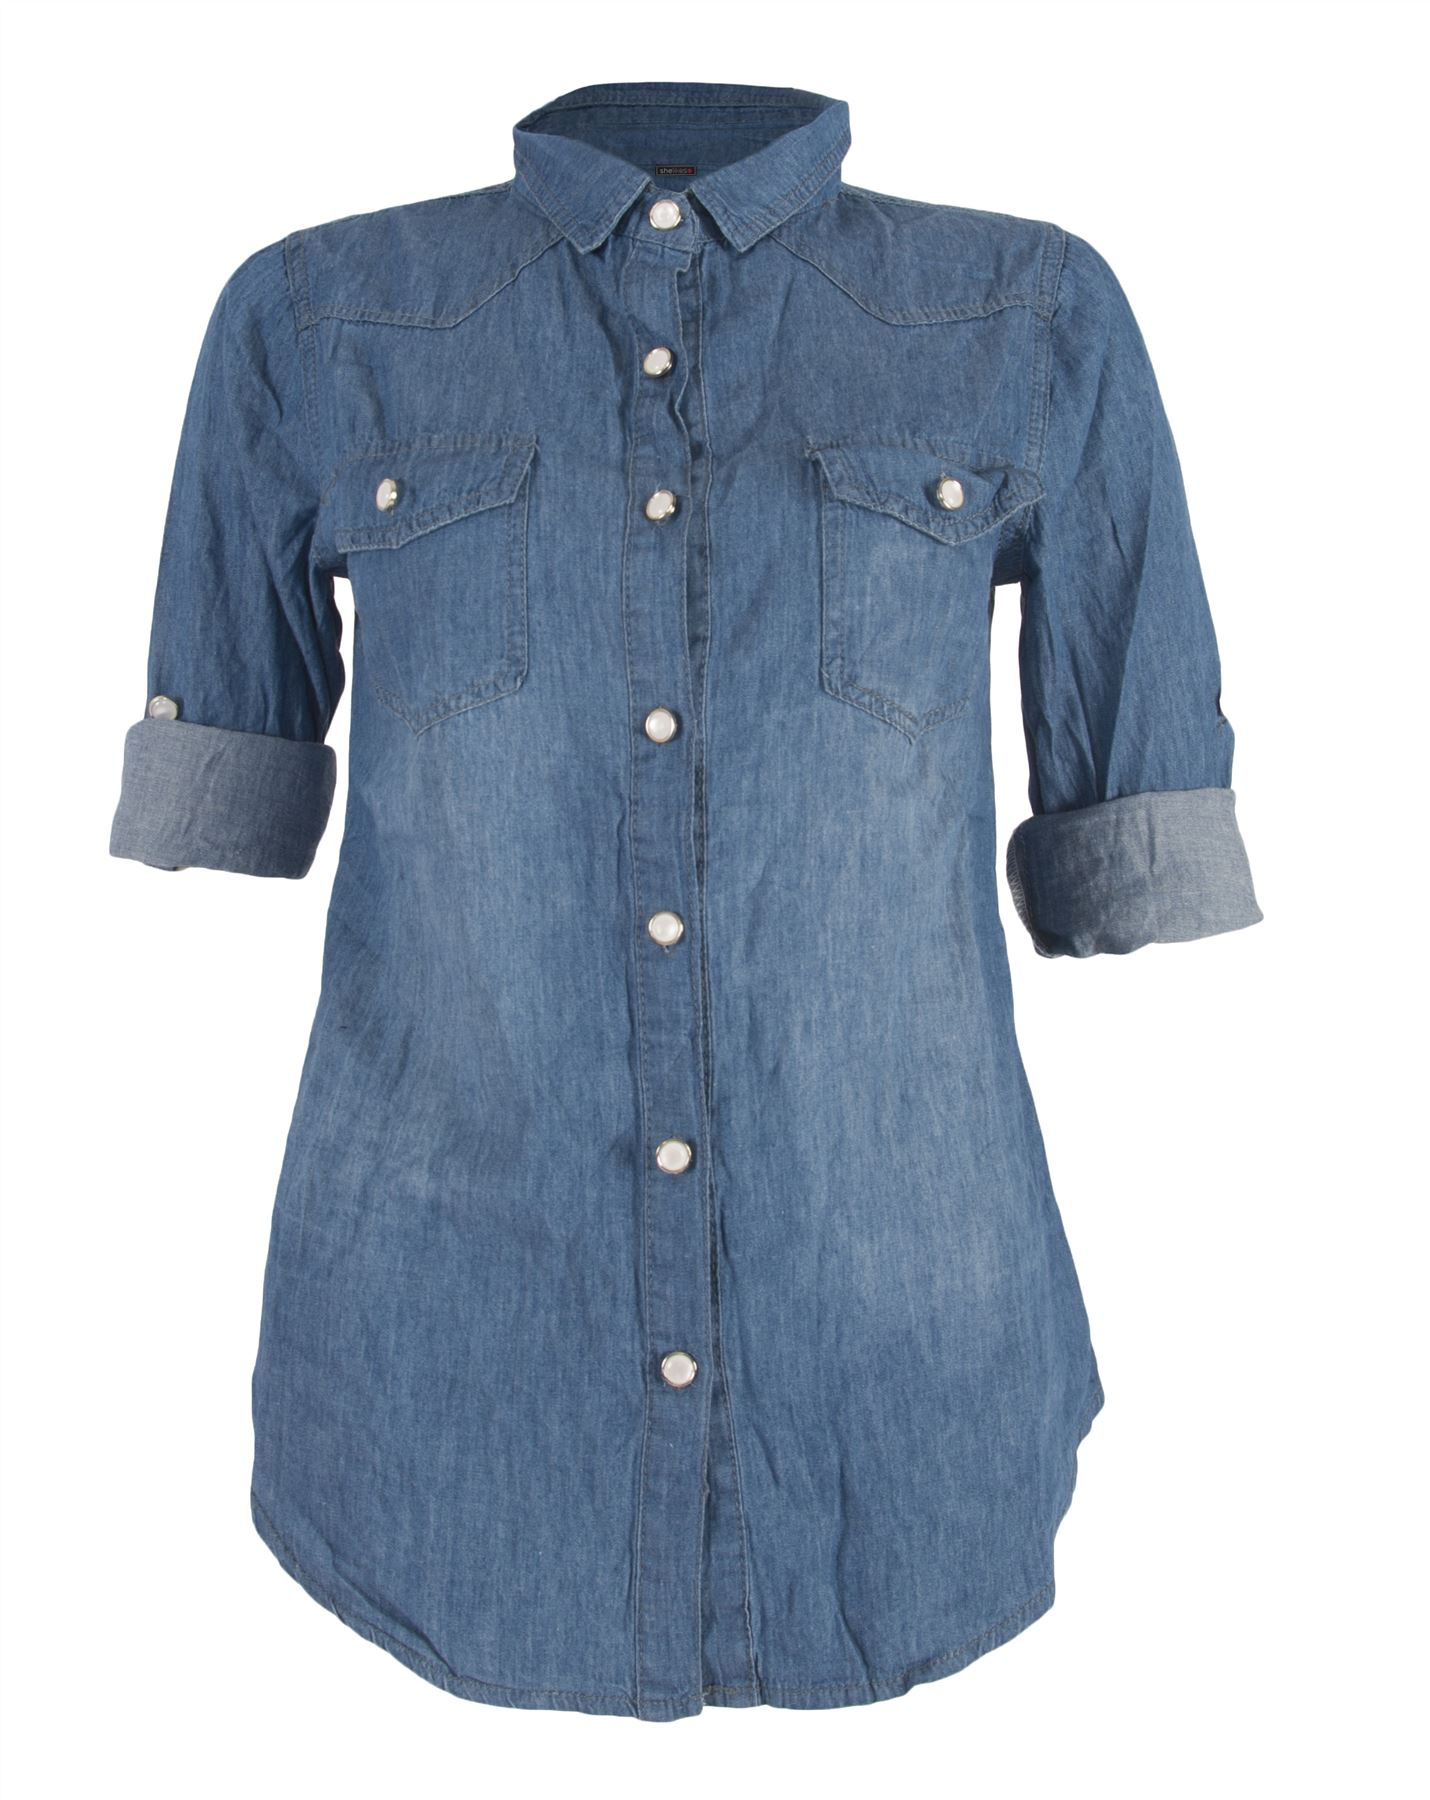 Womens Casual Denim Medium Wash Jean Button Up Classic